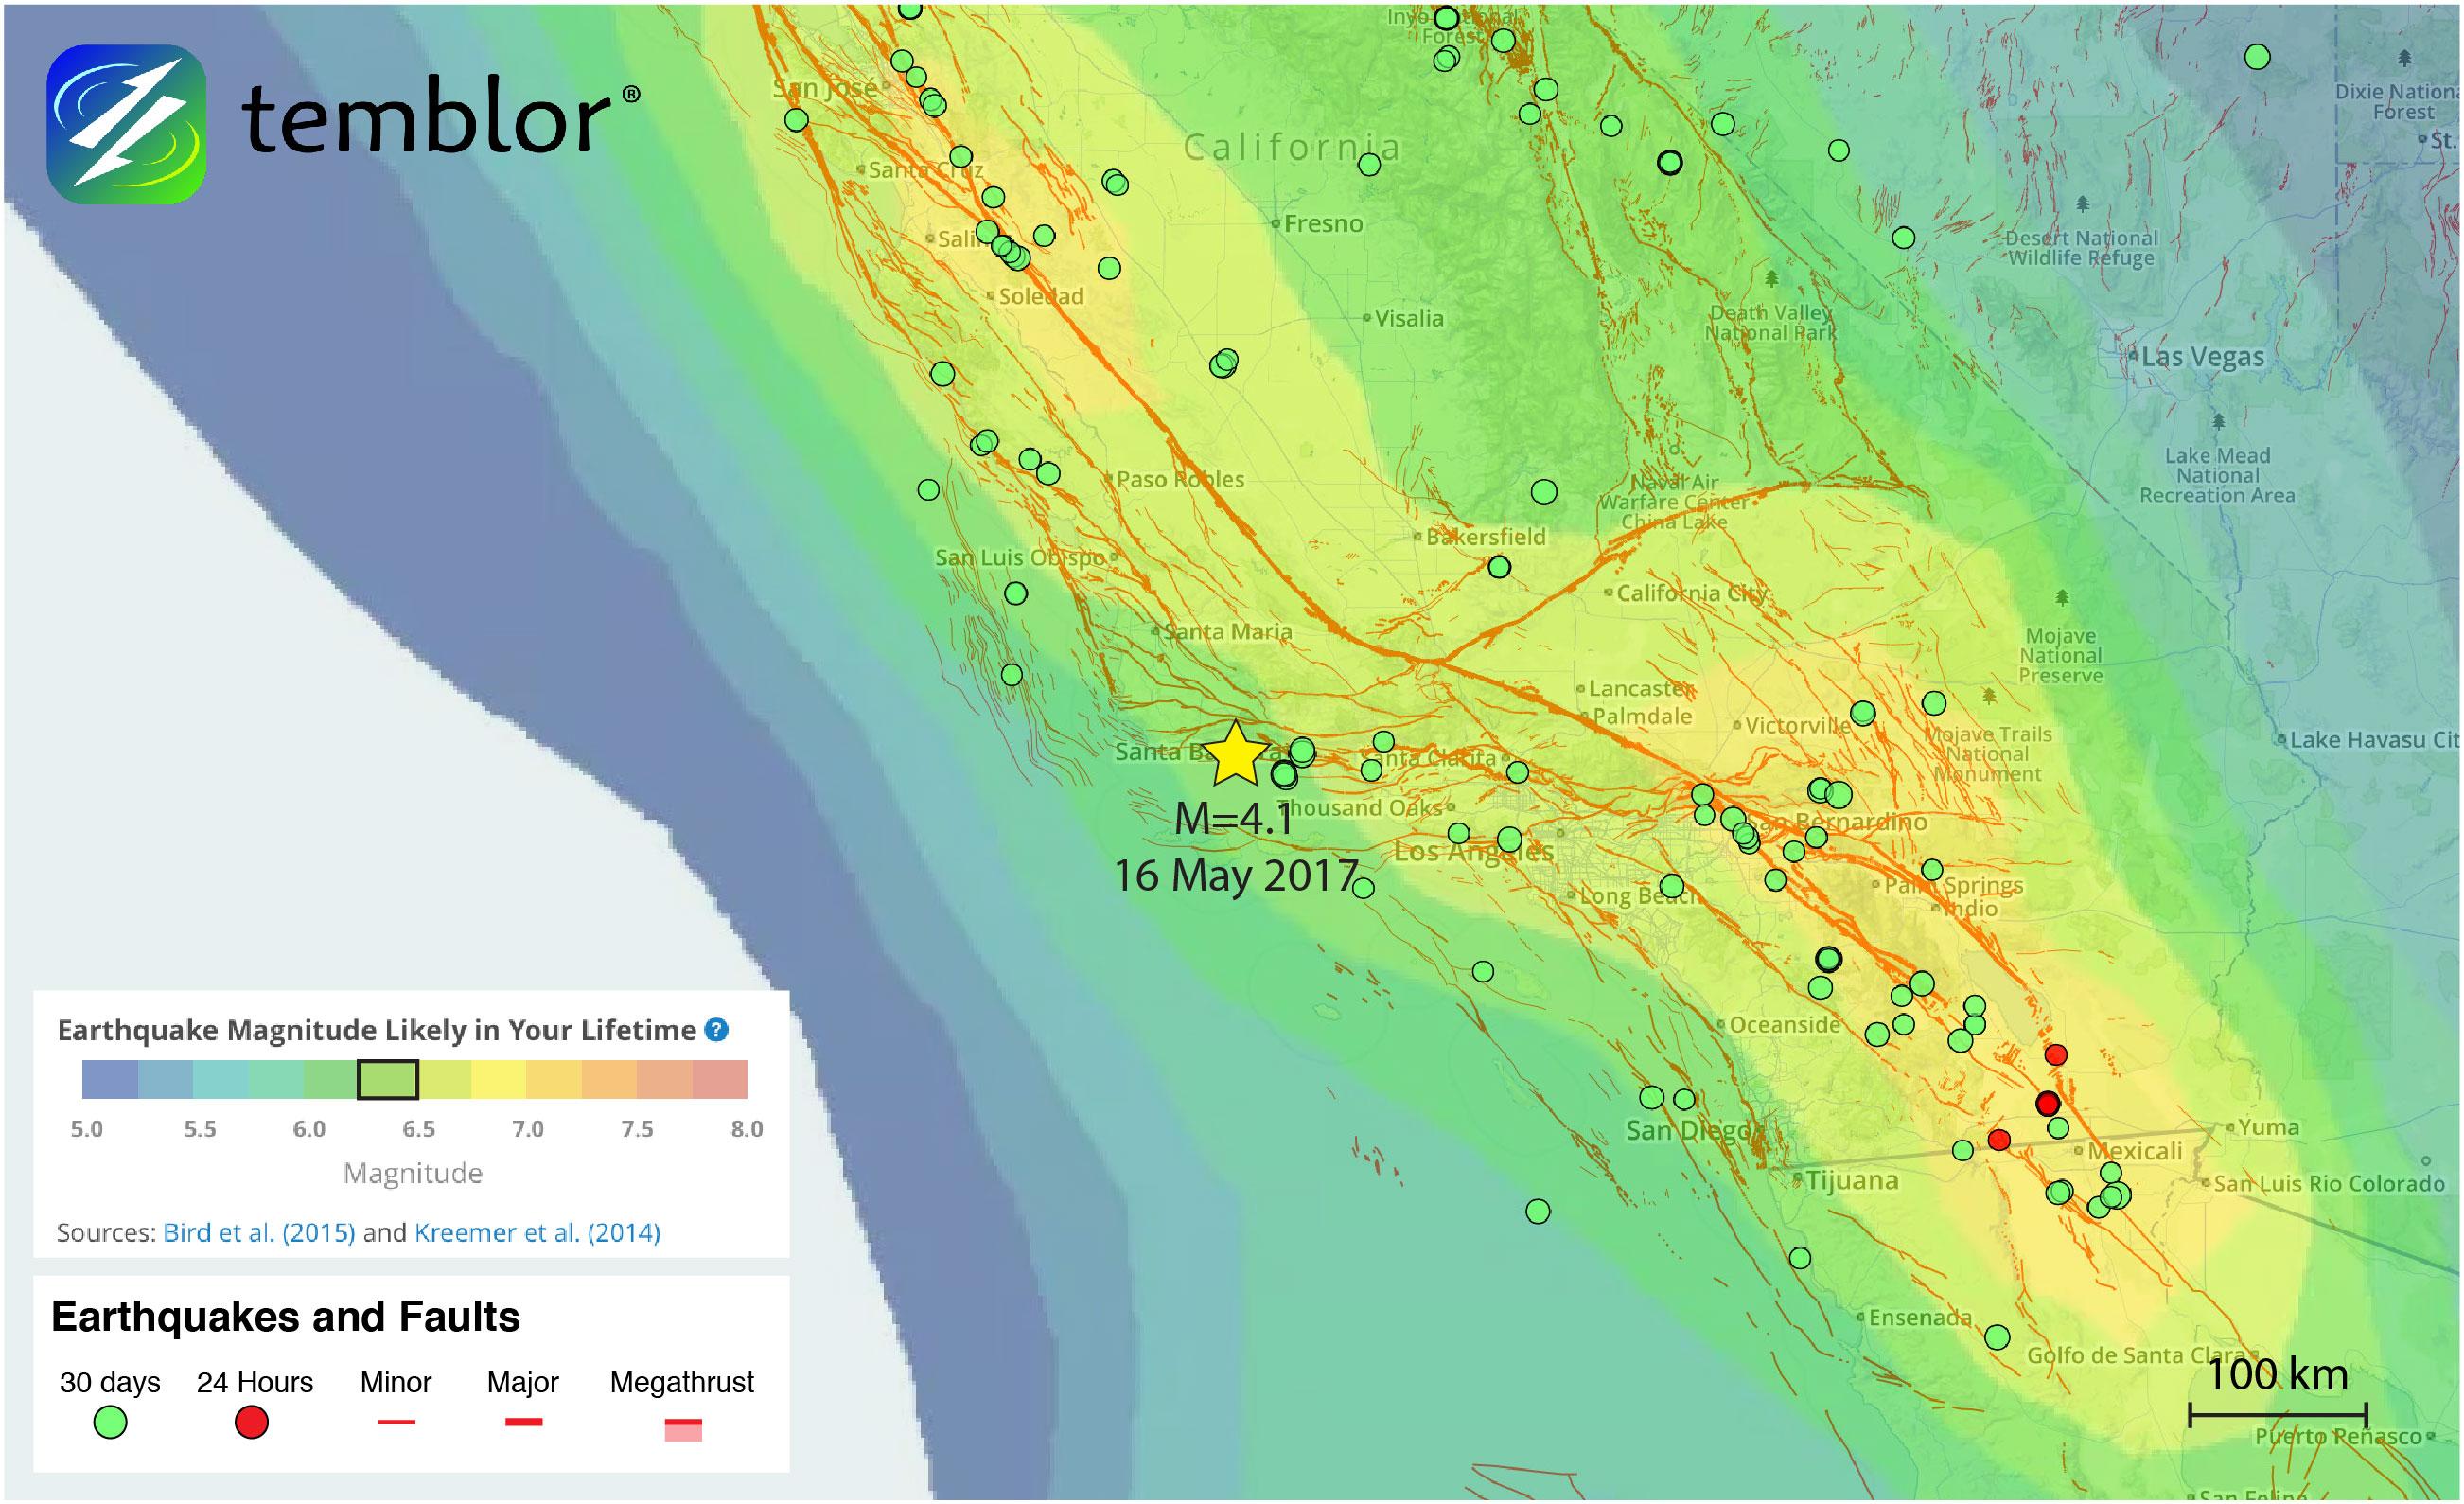 southerncaliforniaearthquakemapearthquakeforecast. southerncaliforniaearthquakemapearthquakeforecast – temblornet